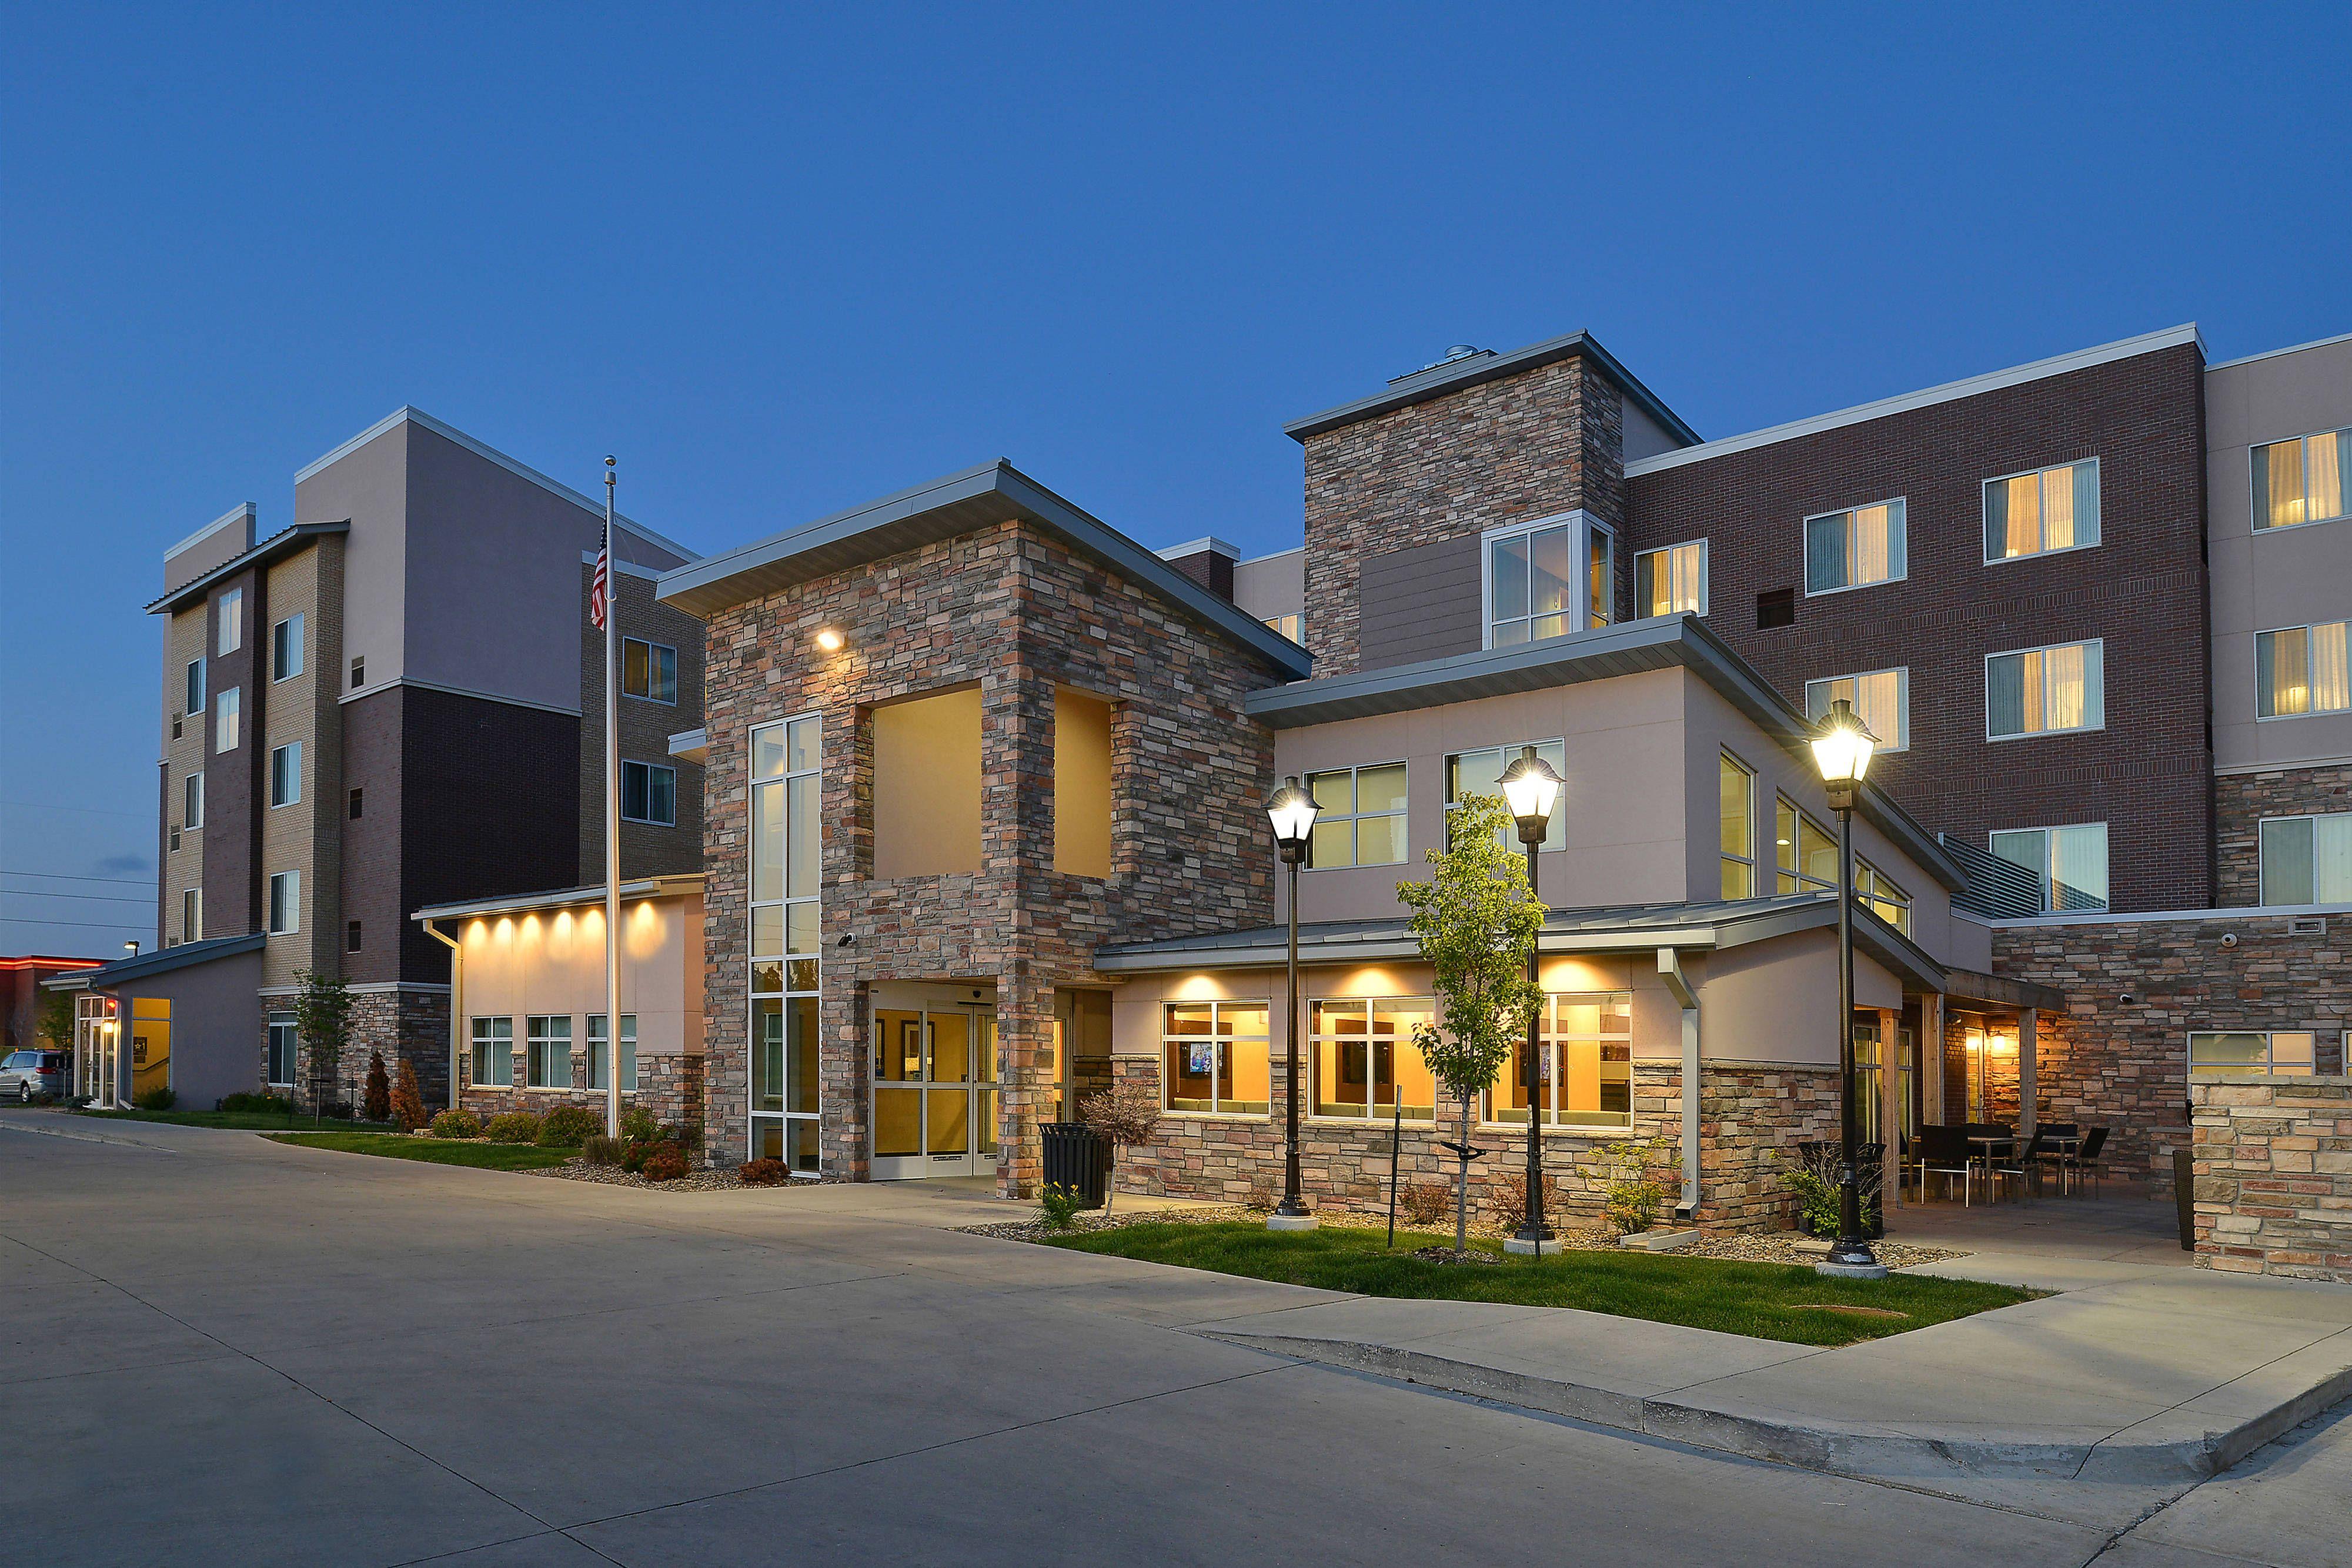 Residence Inn Coralville Entrance Travel Traveling Rooms Marriot Hotel Residences Hotel